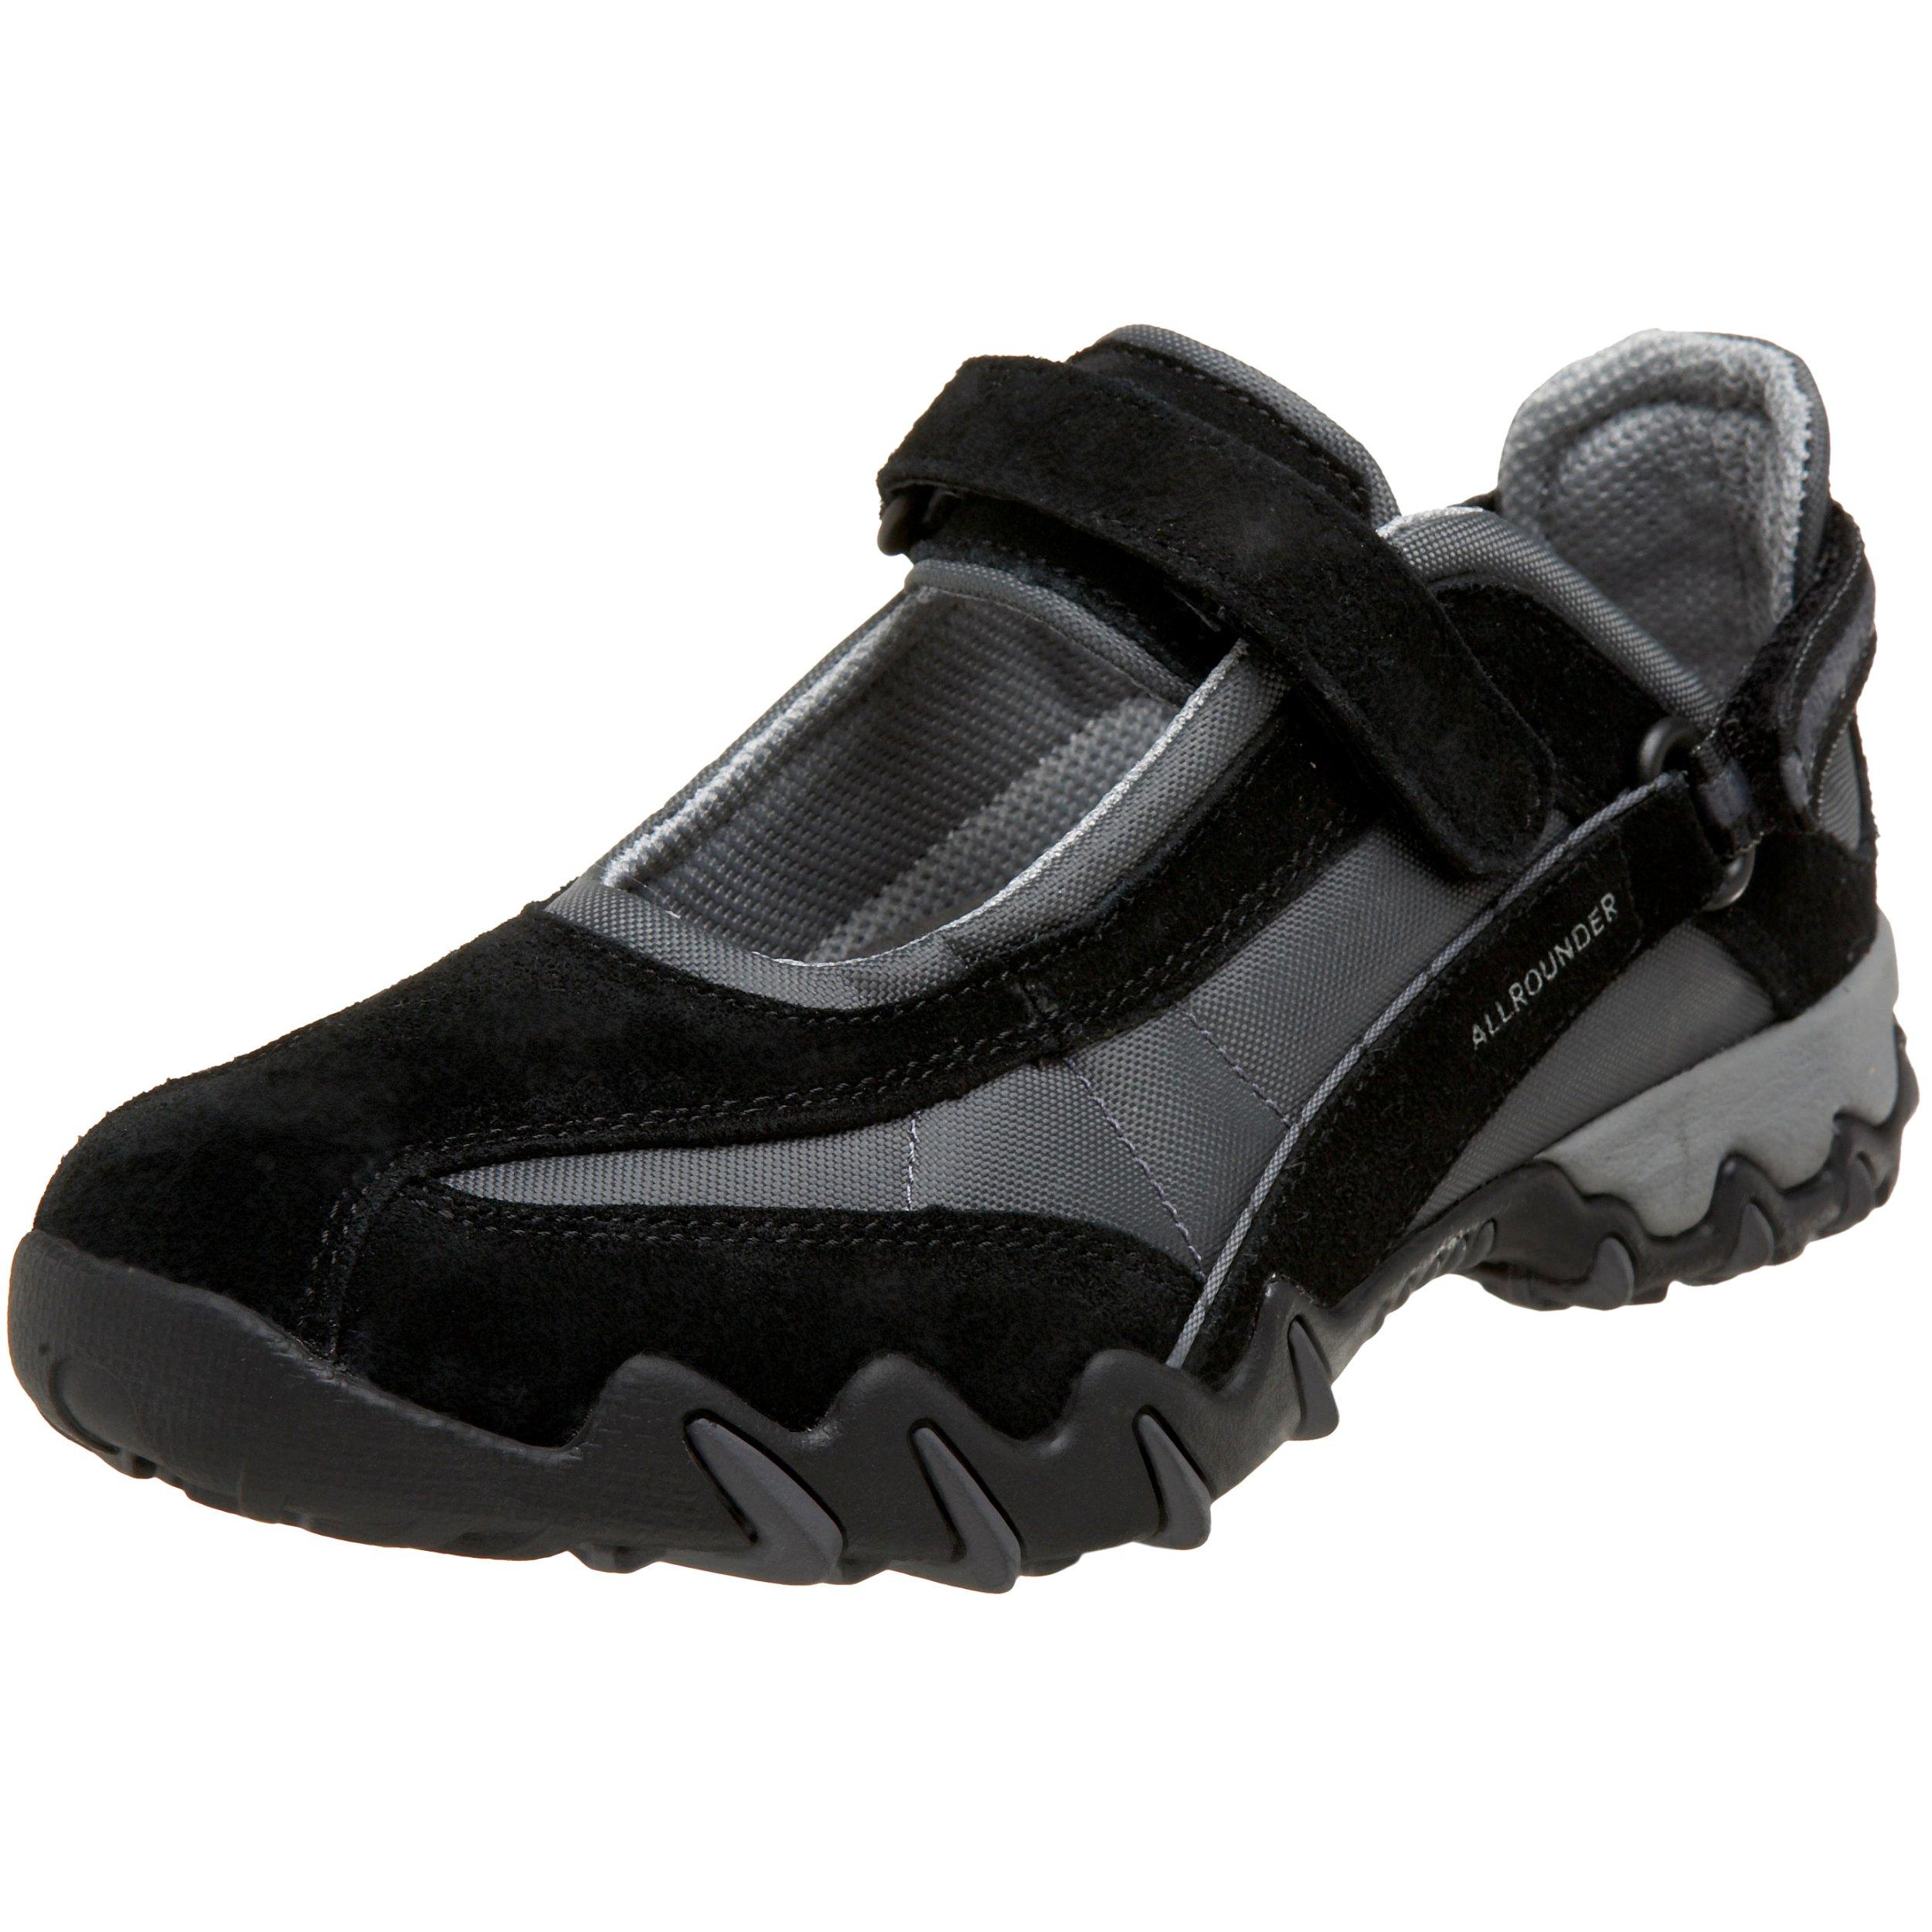 ALLROUNDER by MEPHISTO Women's Niro Mary Jane Sneaker,Black,9 M US